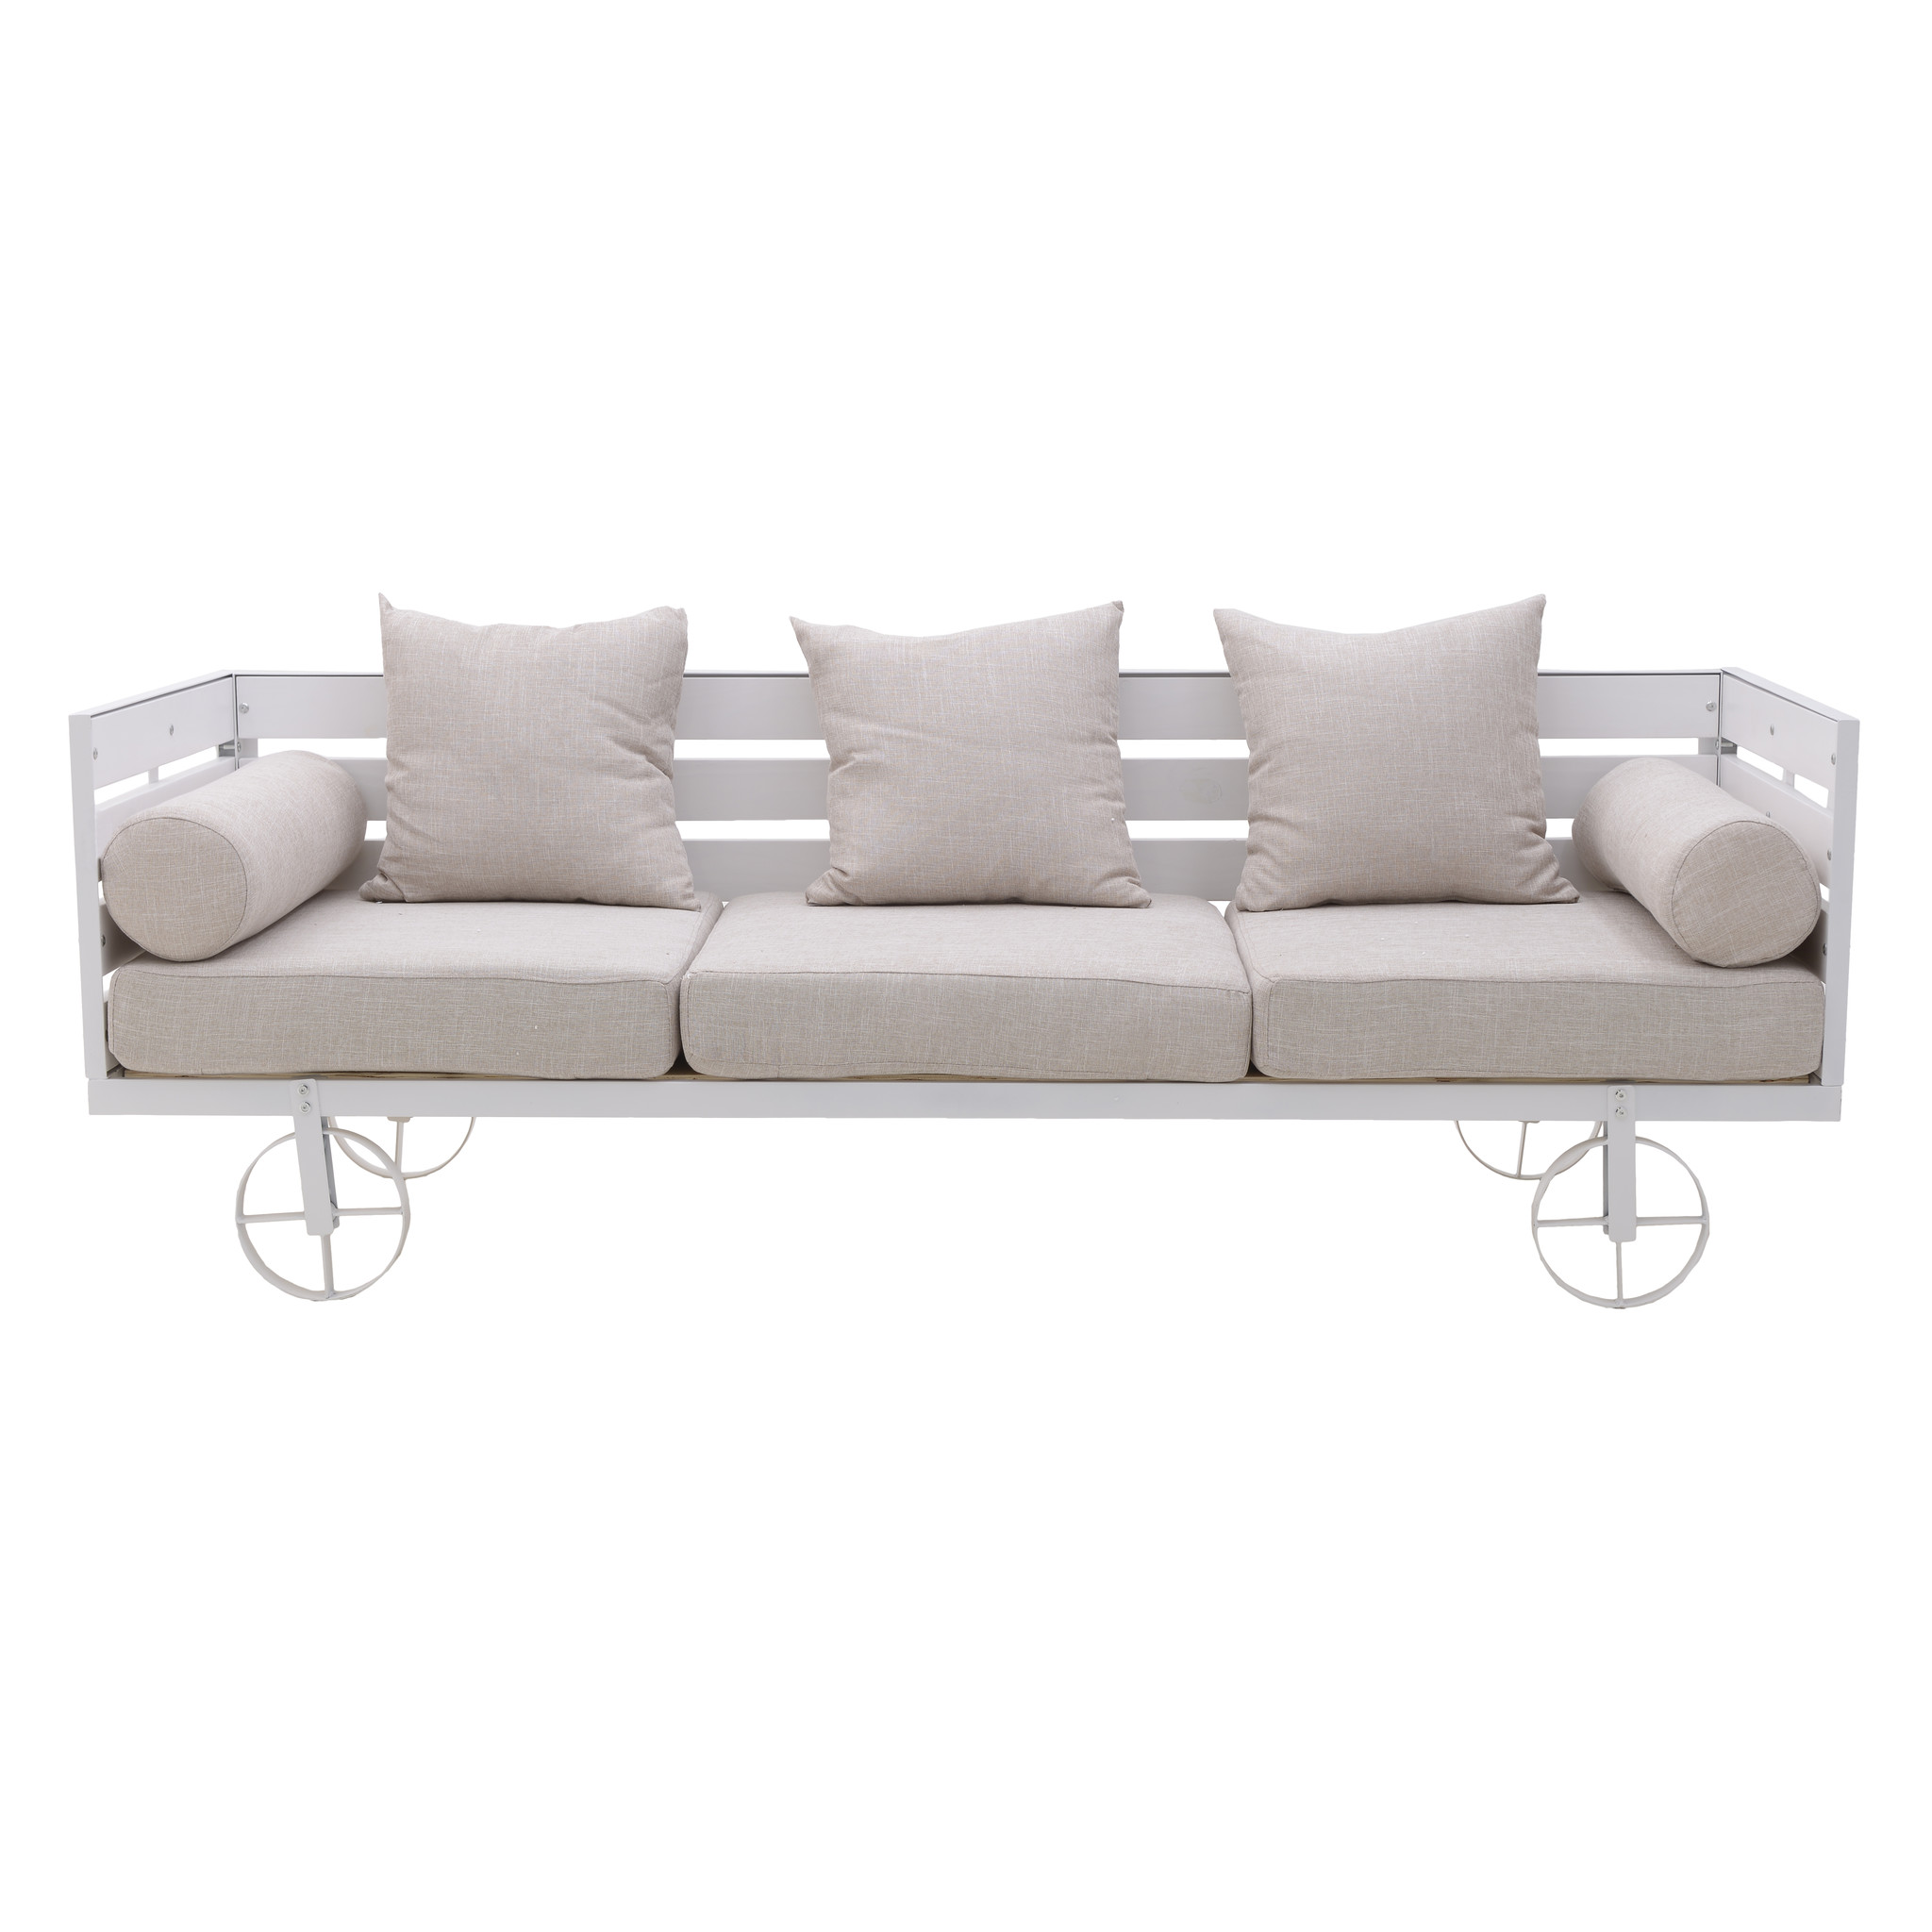 To4rooms диван трехместный zealous белый 136422/2